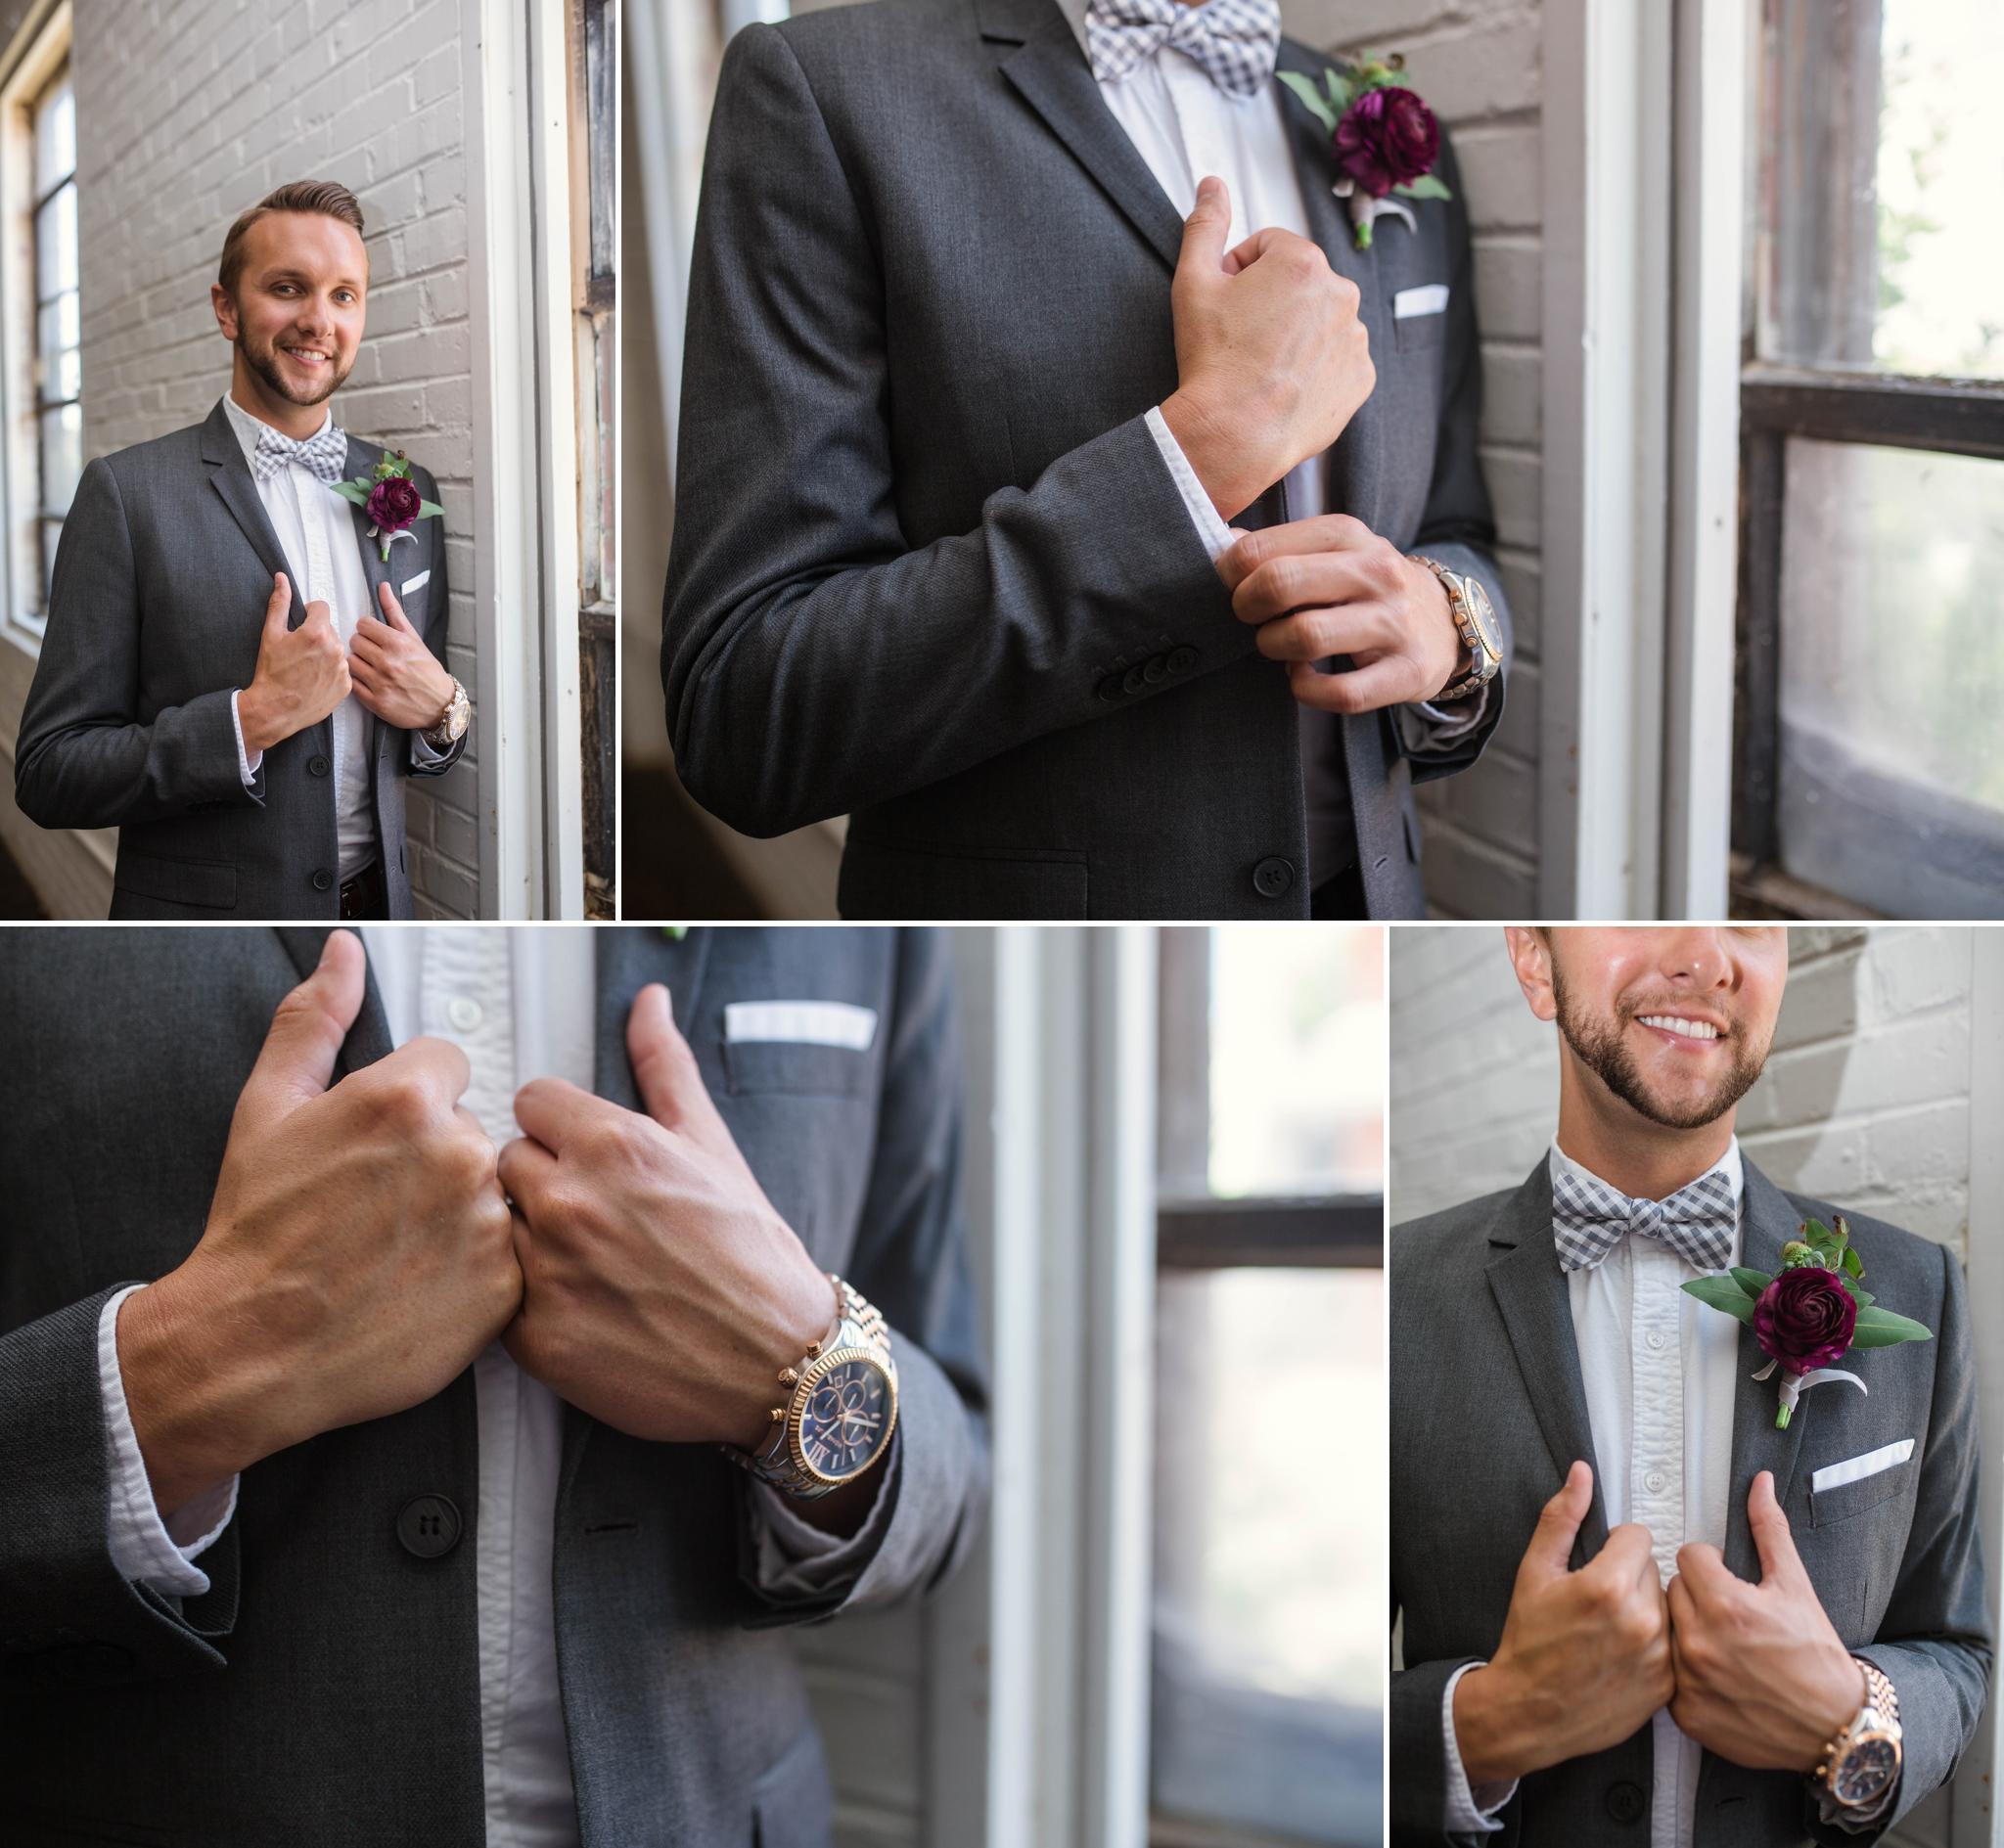 Gay and Lesbian friendly Wedding Photographer in Raleigh North Carolina - Johanna Dye Photography 9.jpg